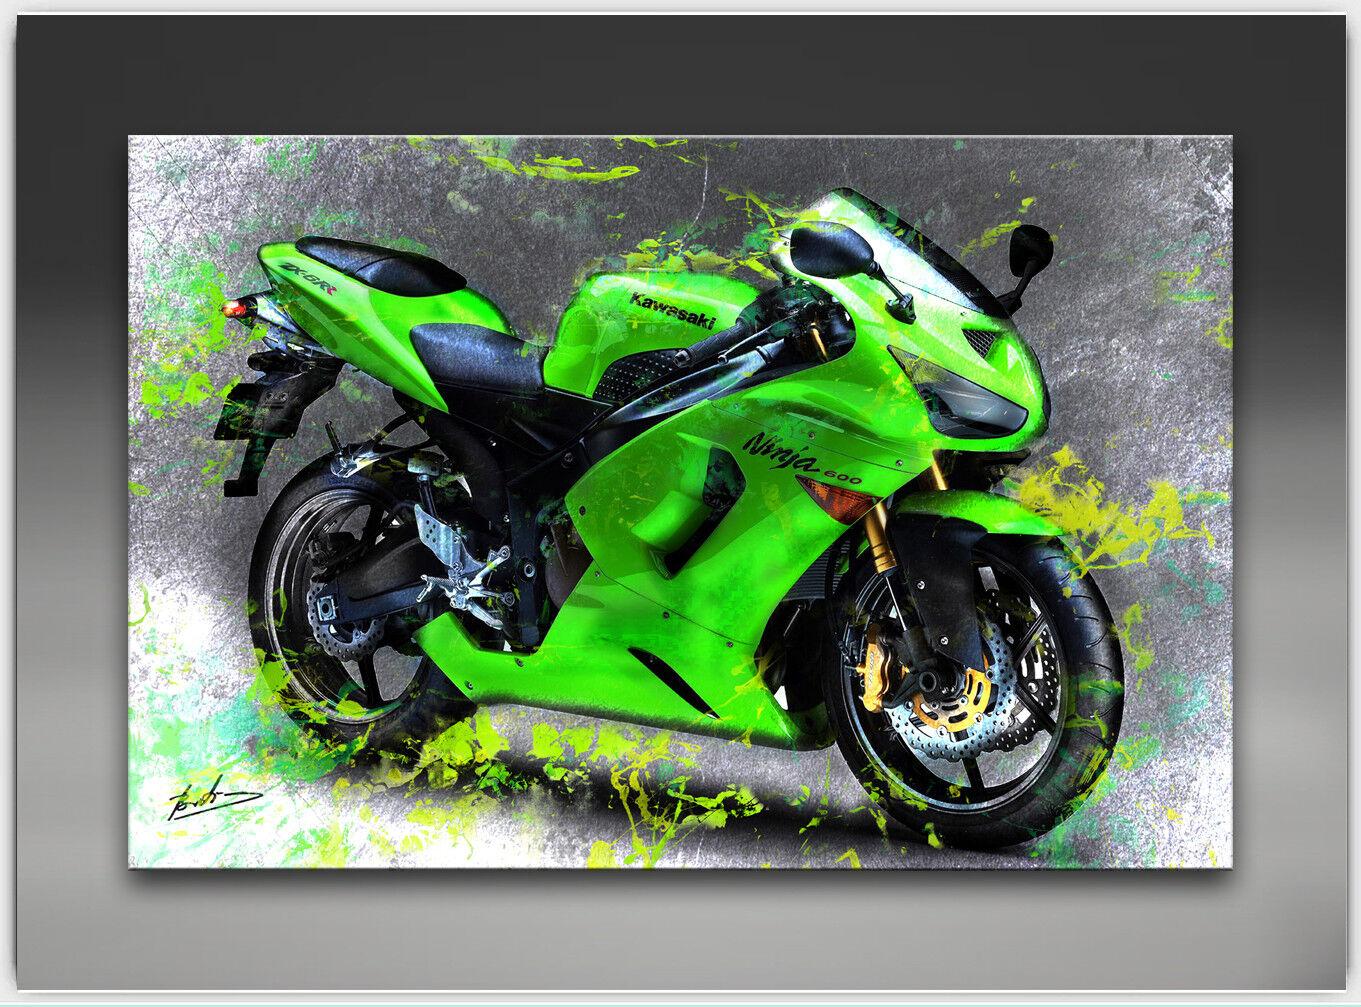 Toile deco Photos Kawasaki Ninja 600 Moto deco Toile art la fresque art pression 1544 a 2fa12e